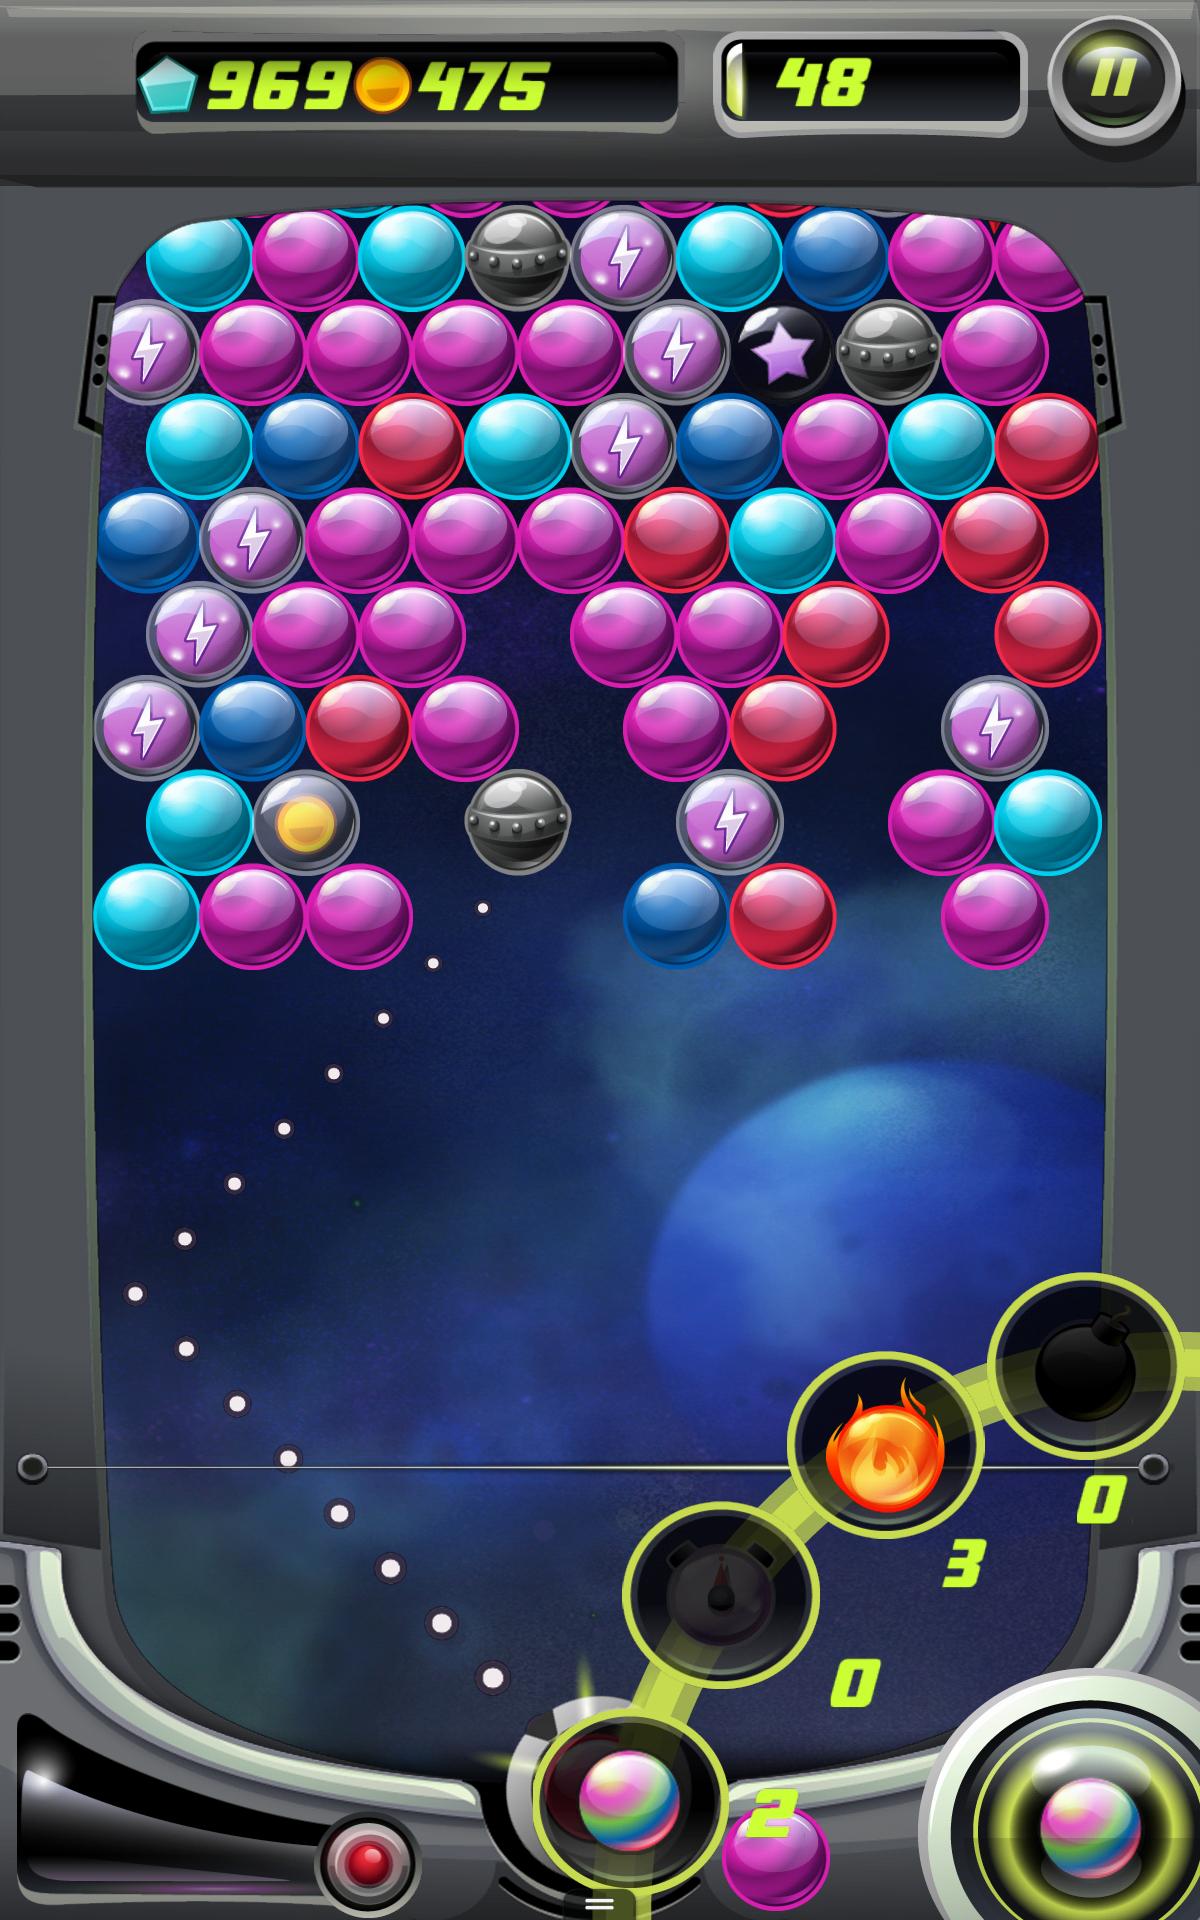 Bubble Shooter SГјddeutsche